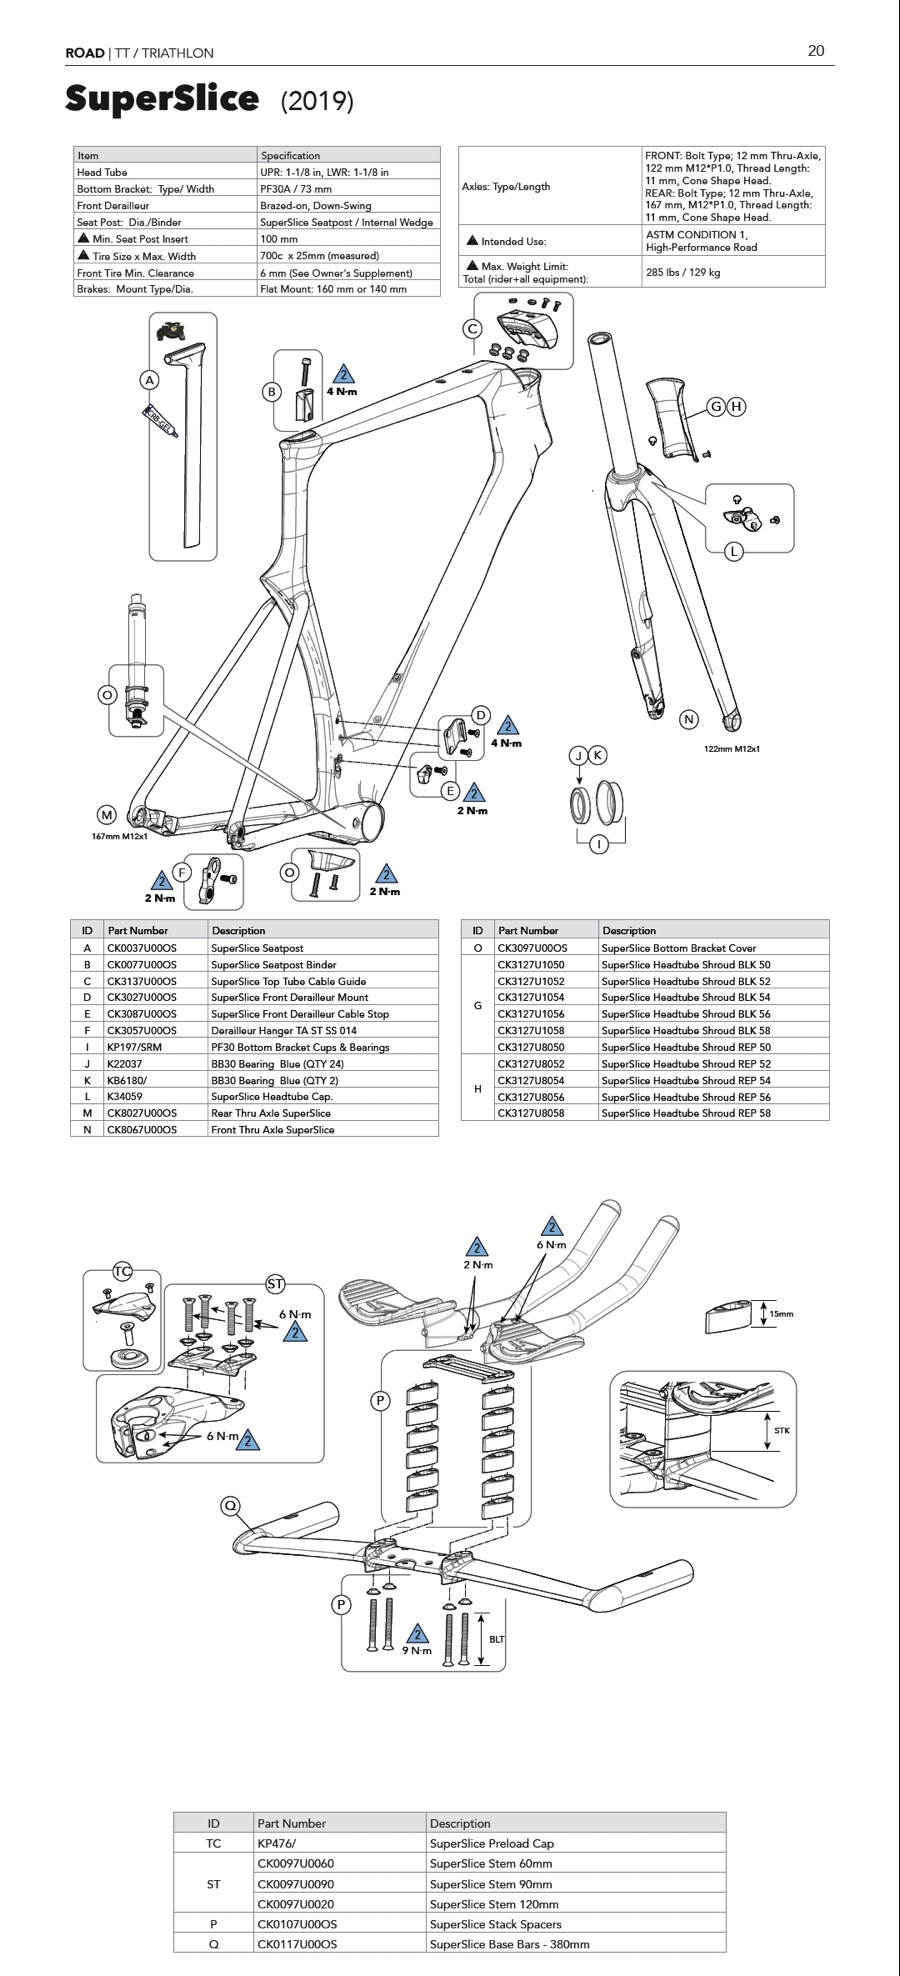 SuperSlice Parts